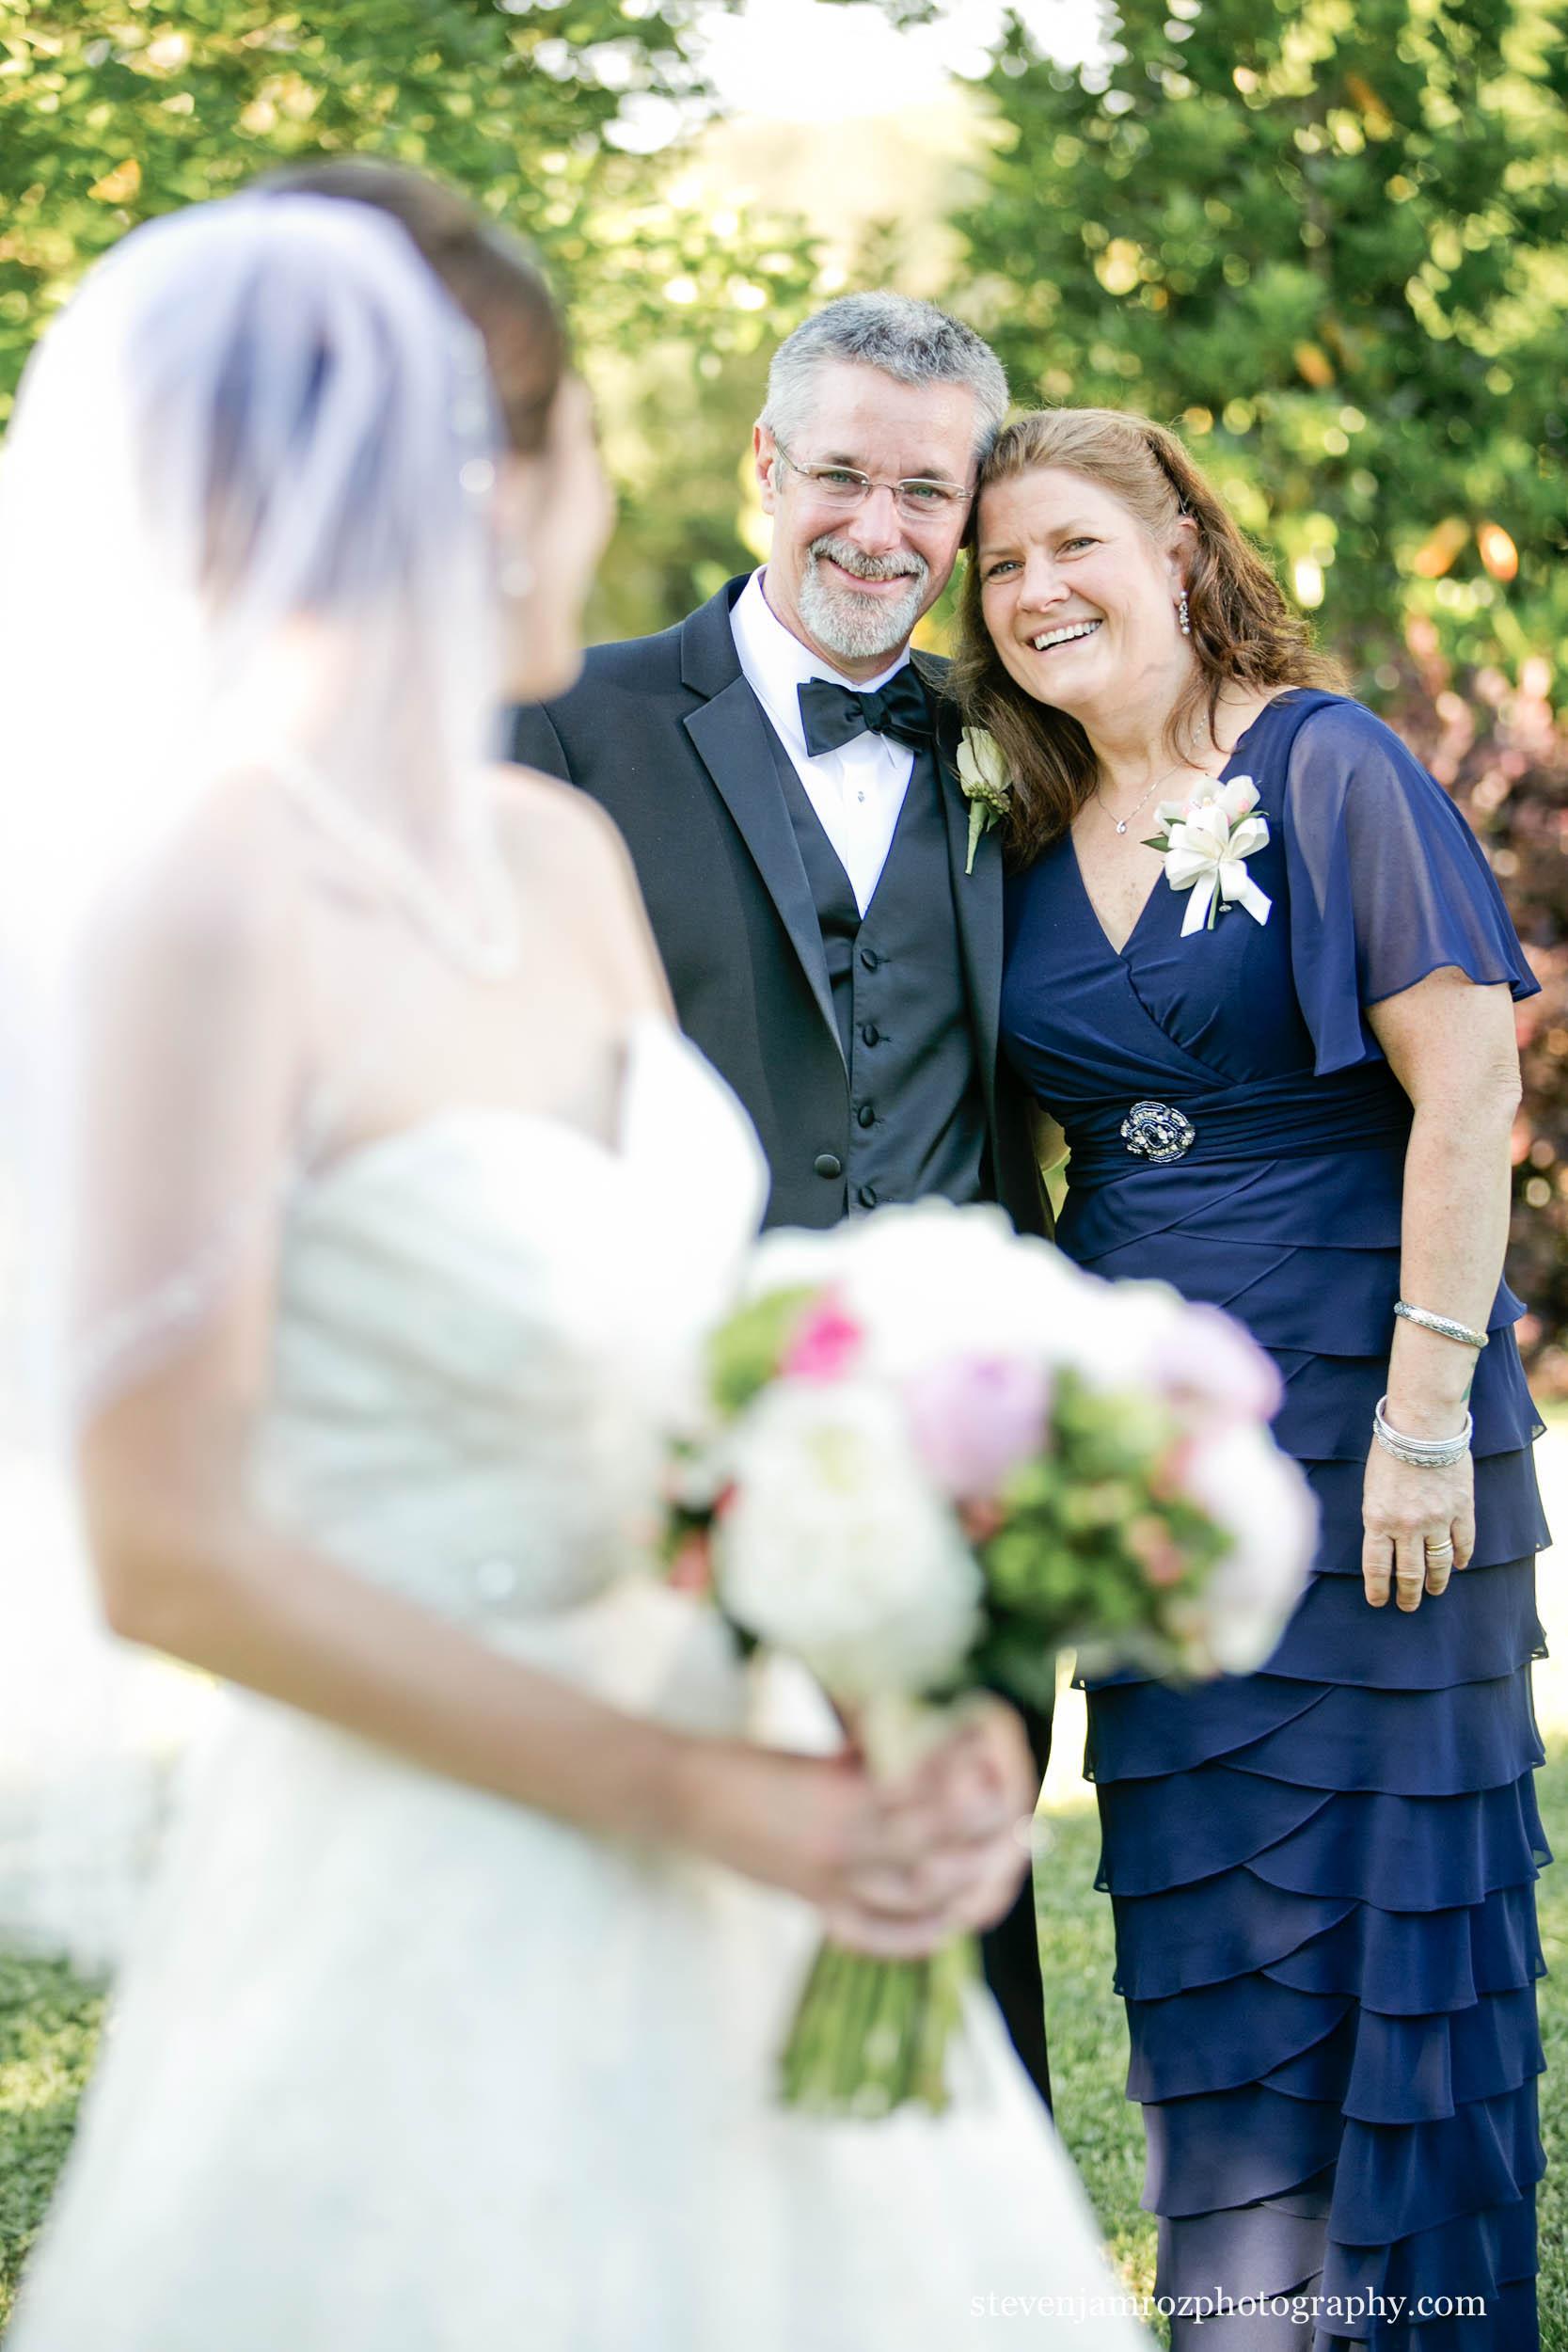 mom-dad-bride-together-wedding-photography-0969.jpg